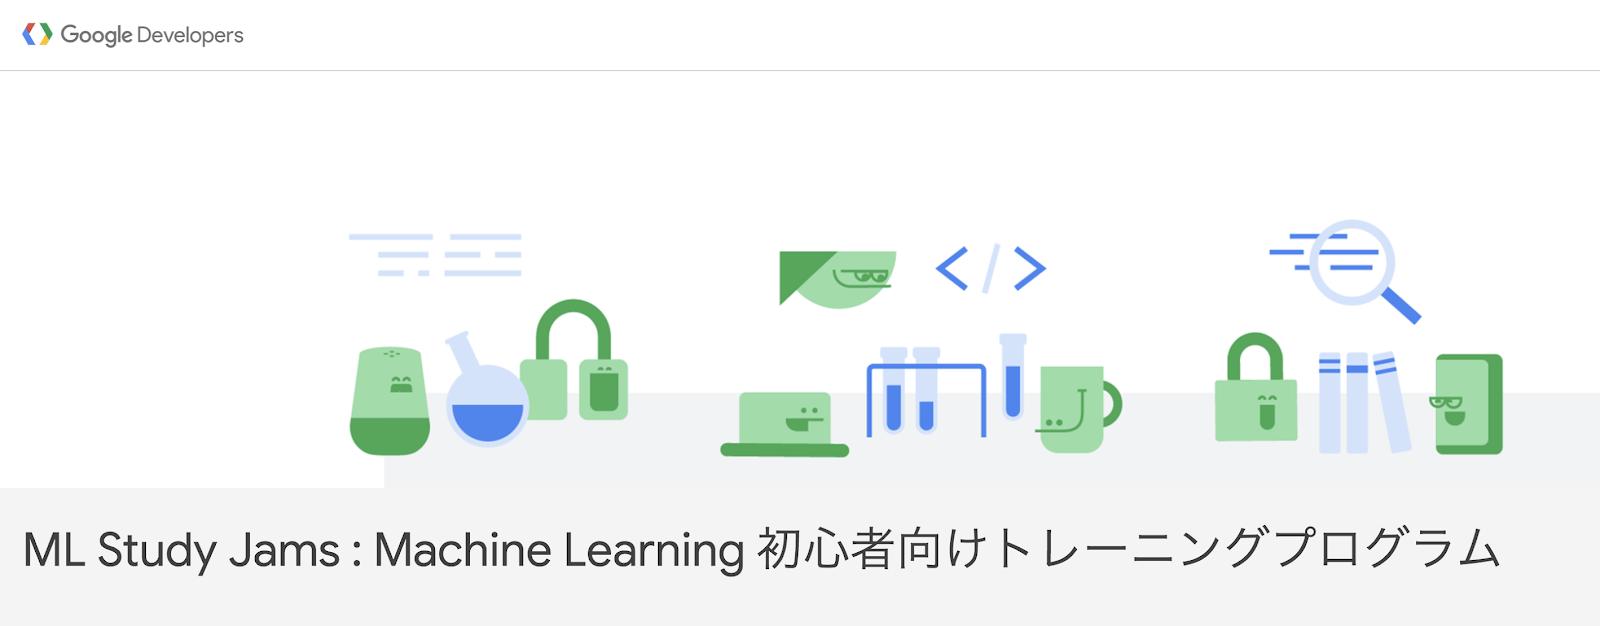 Google Developers Japan: ML Study Jams : Machine Learning 初心者向け